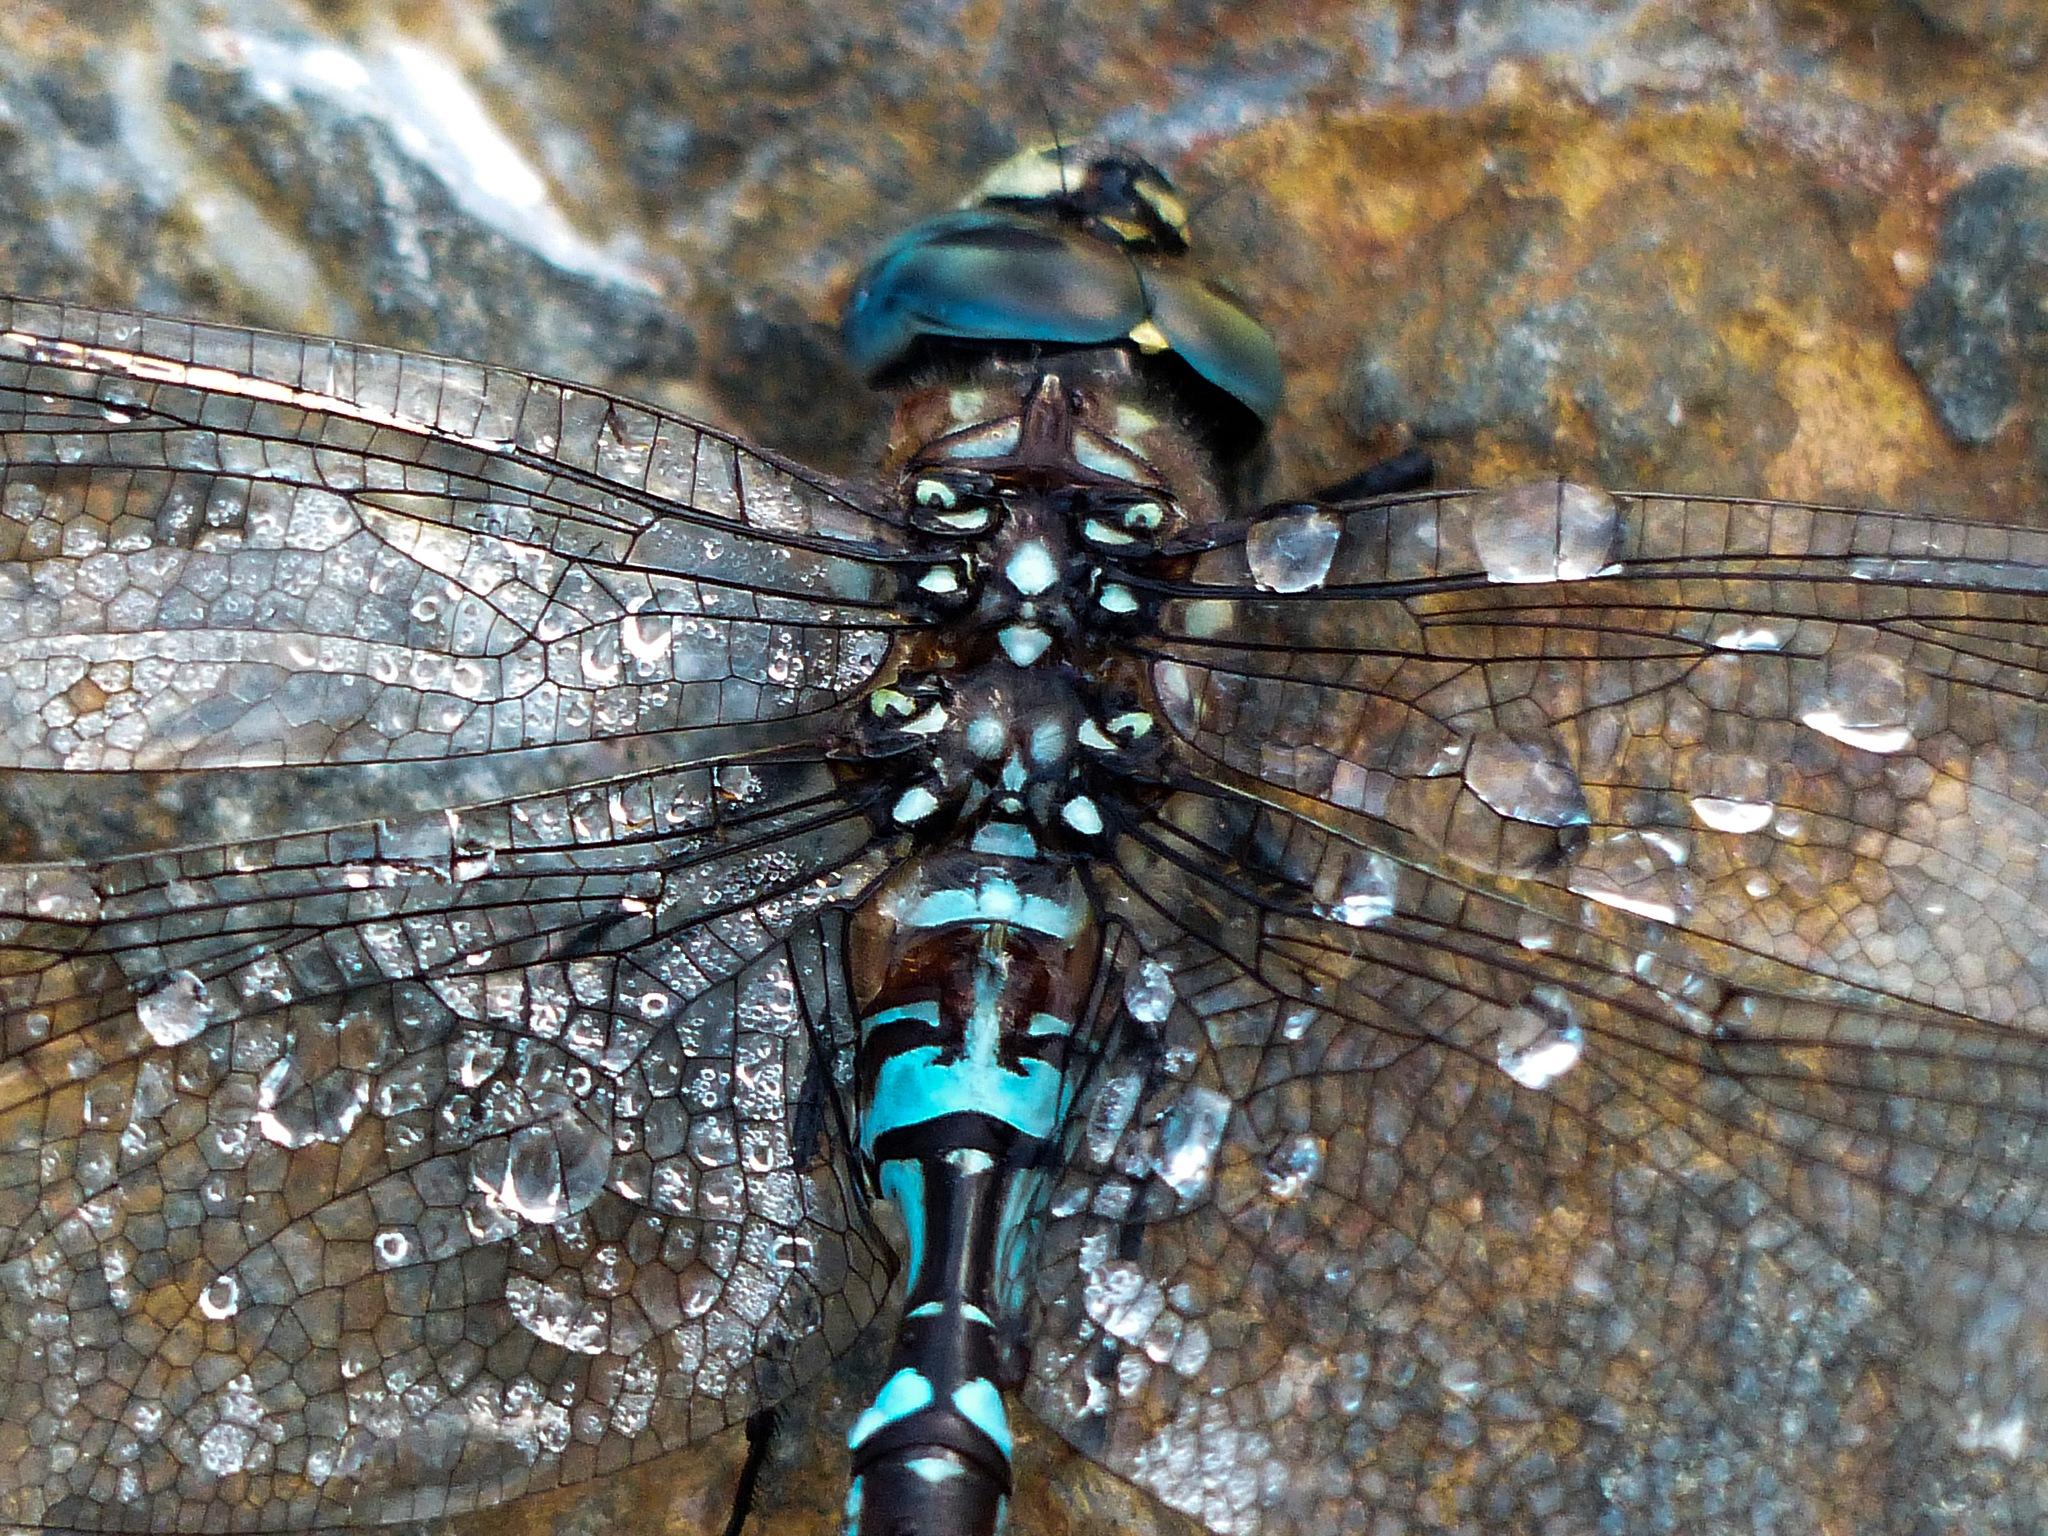 Wet Dragon Fly by Brigitte Werner